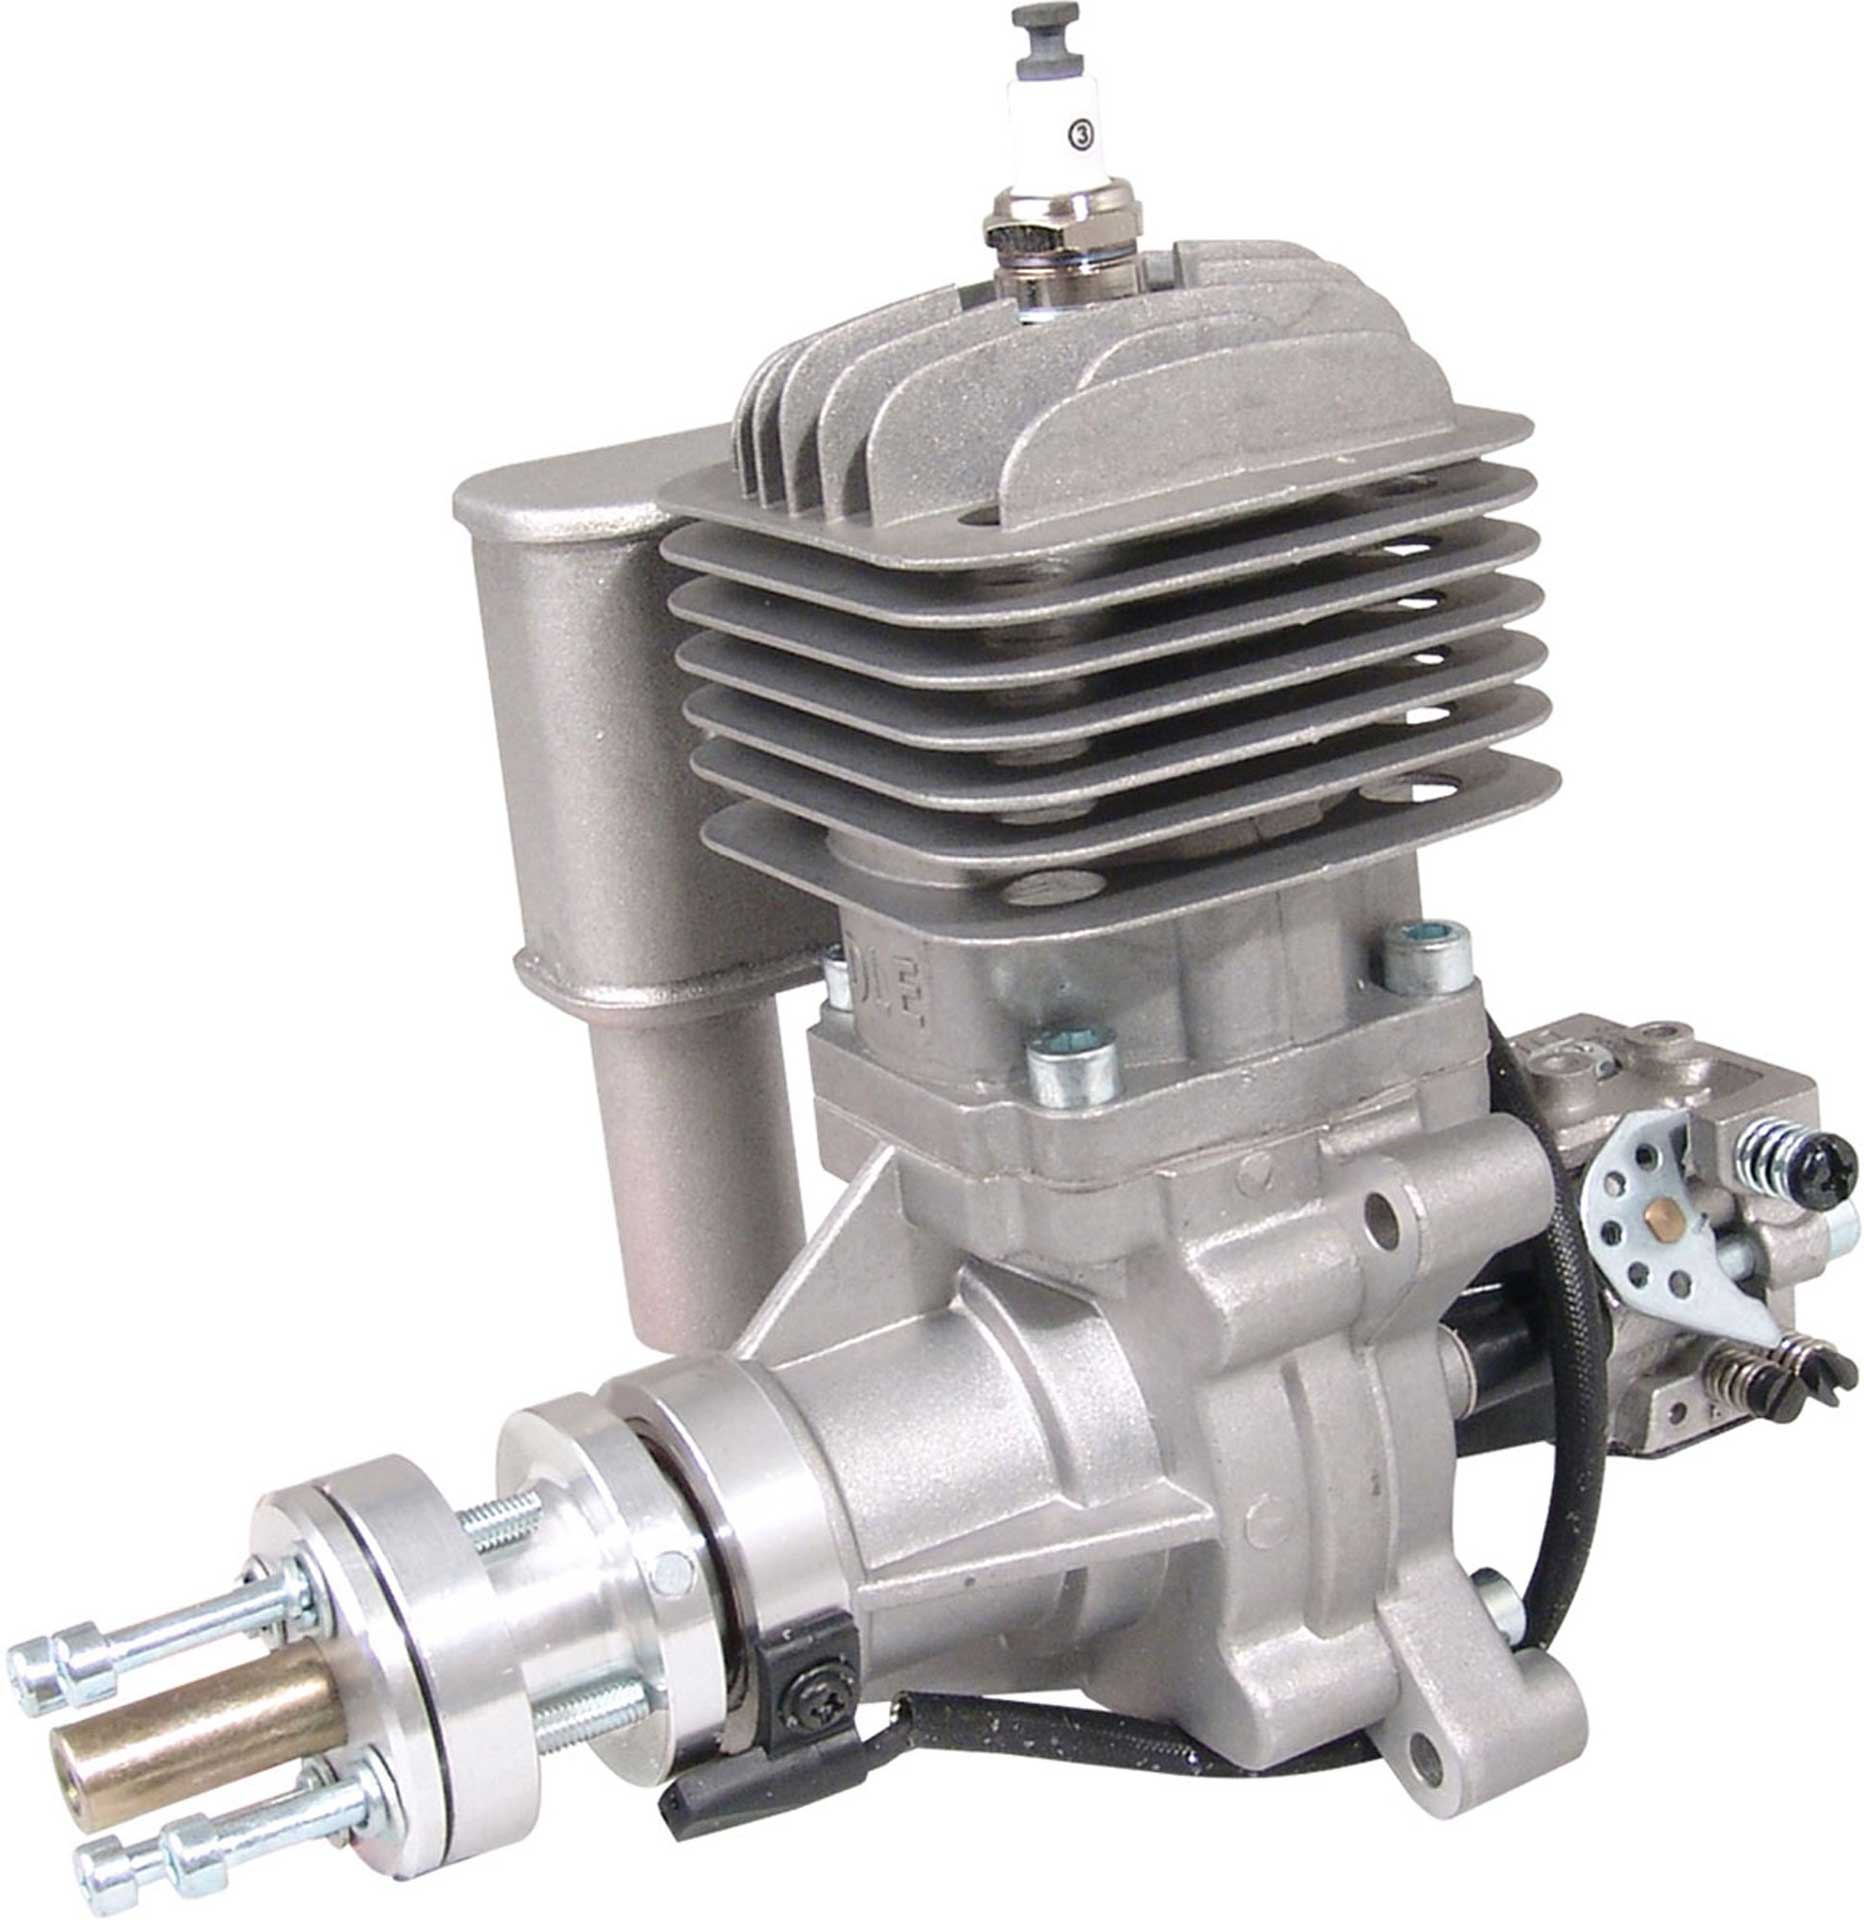 DLE Engines DLE 30 BENZIN MOTOR SEITENAUSLASS